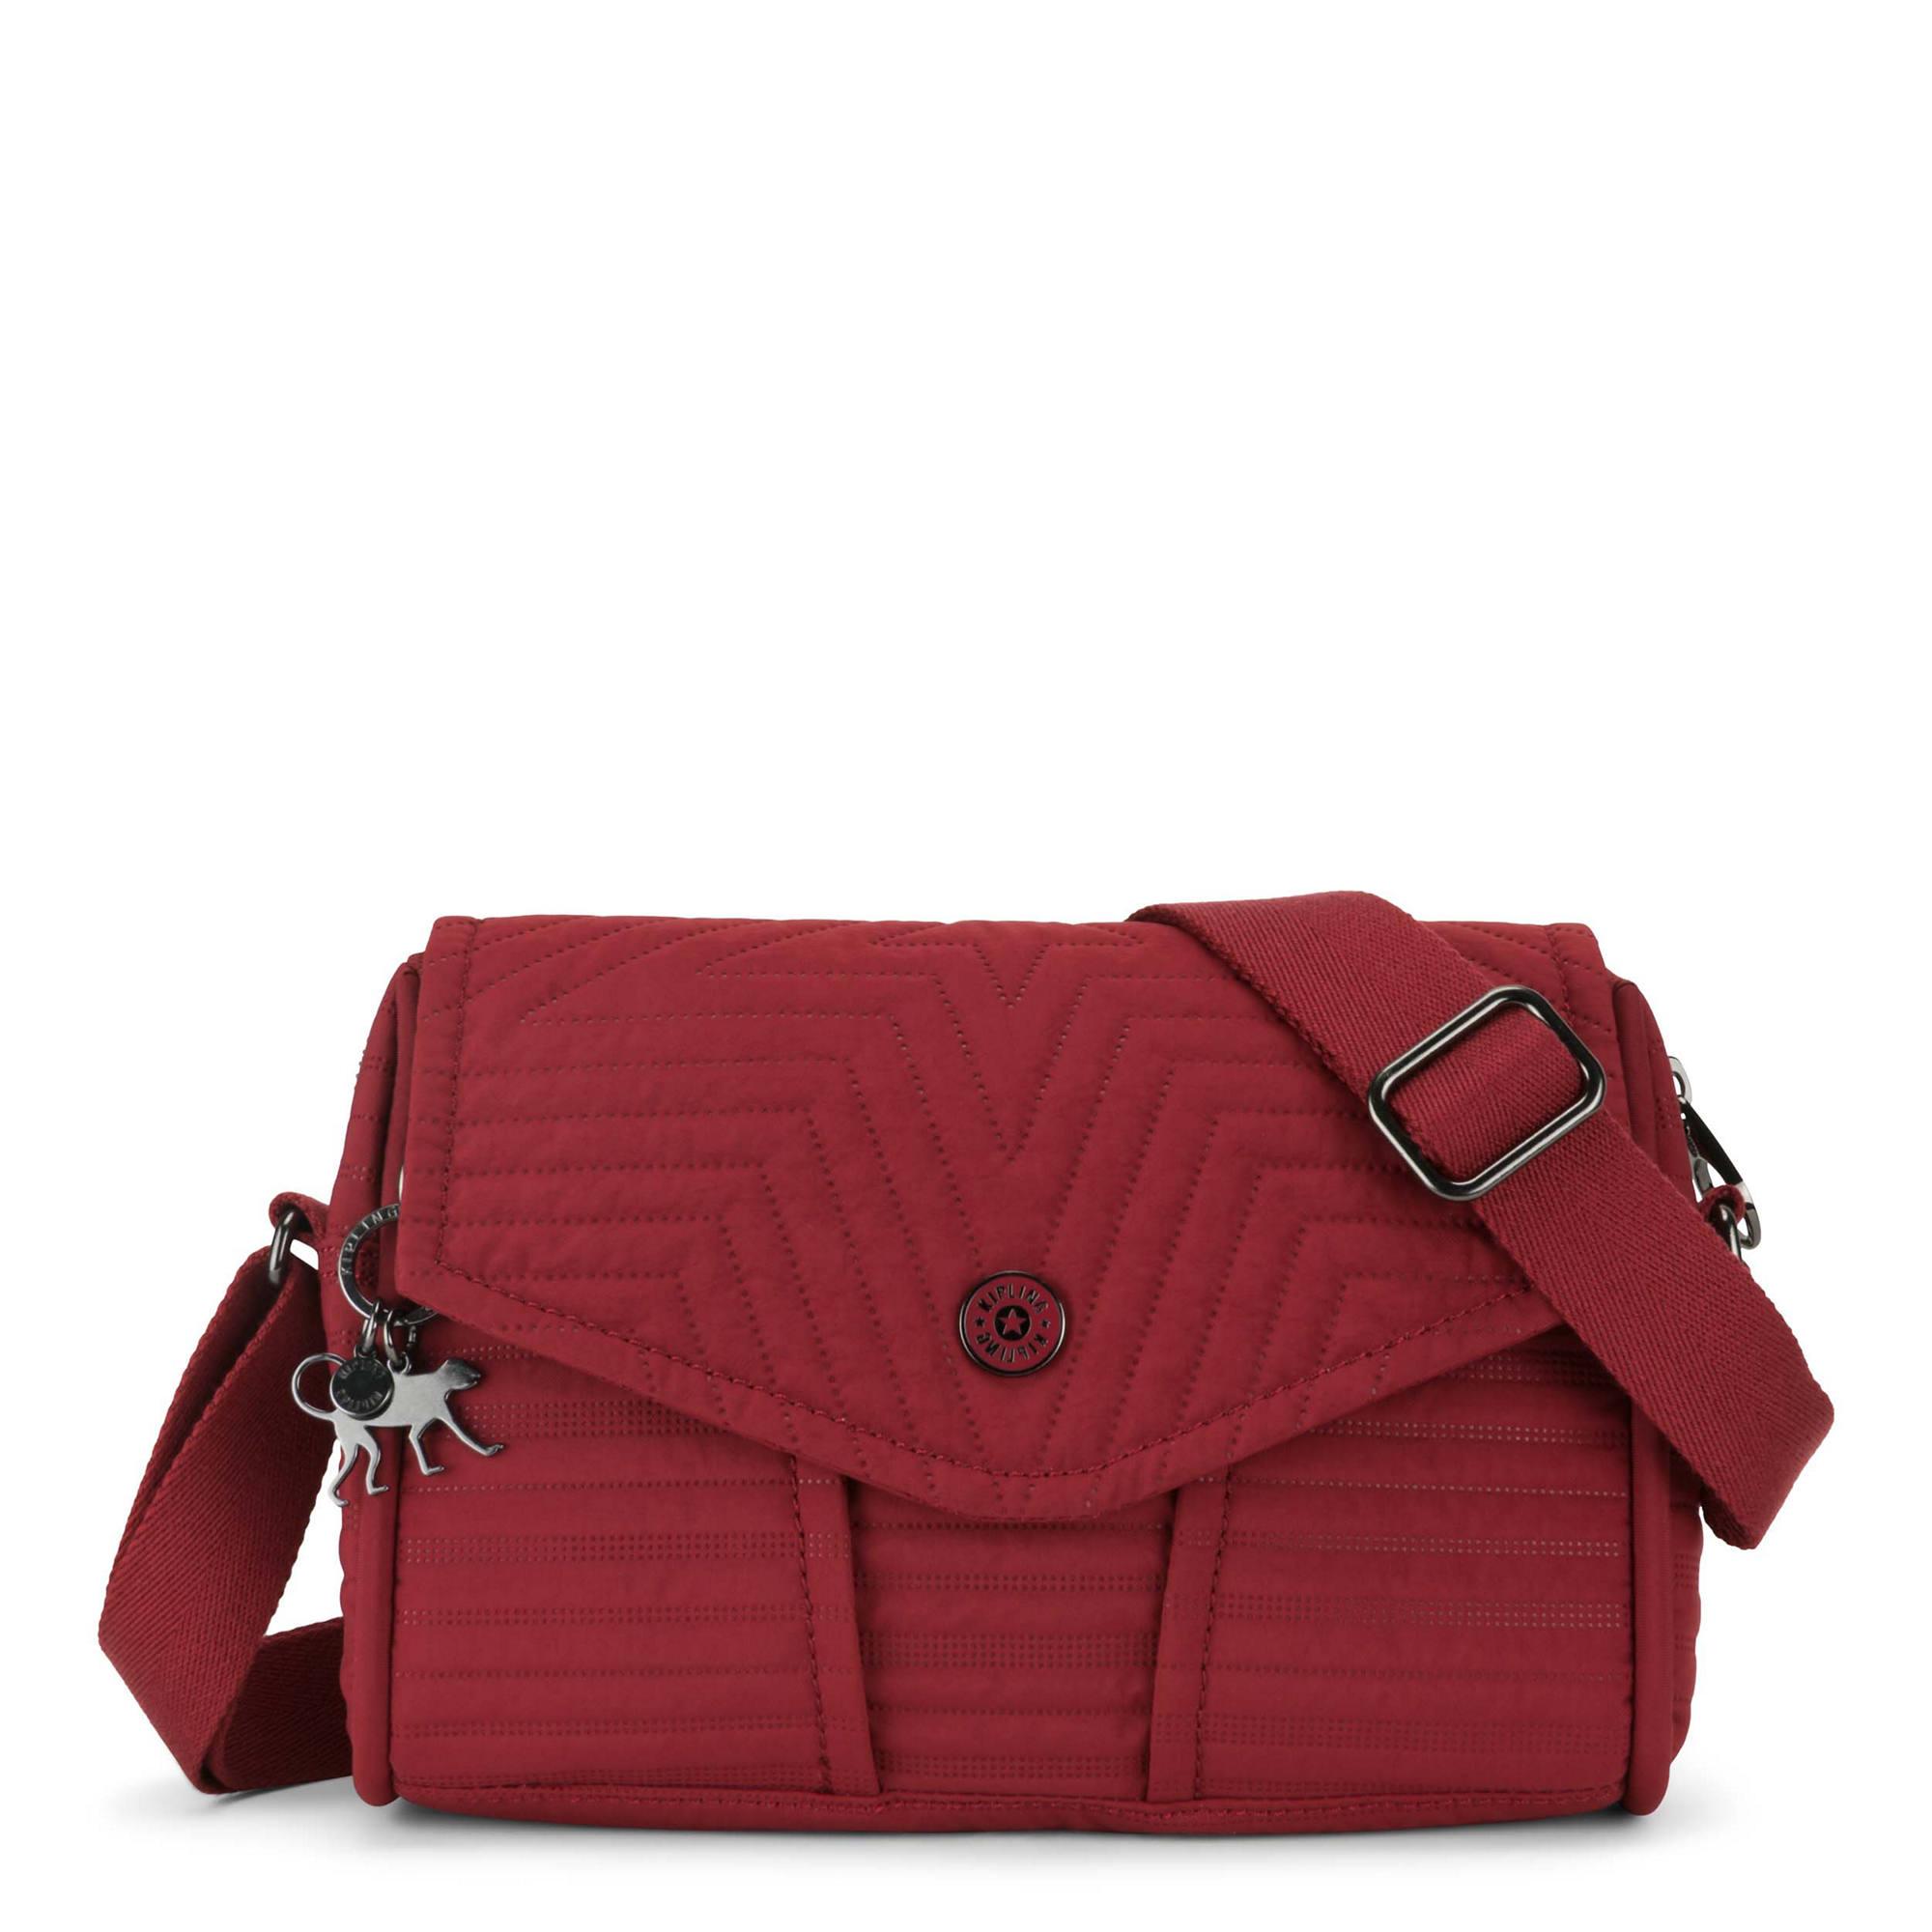 0059ee3304ab Ready Now Small Crossbody Bag